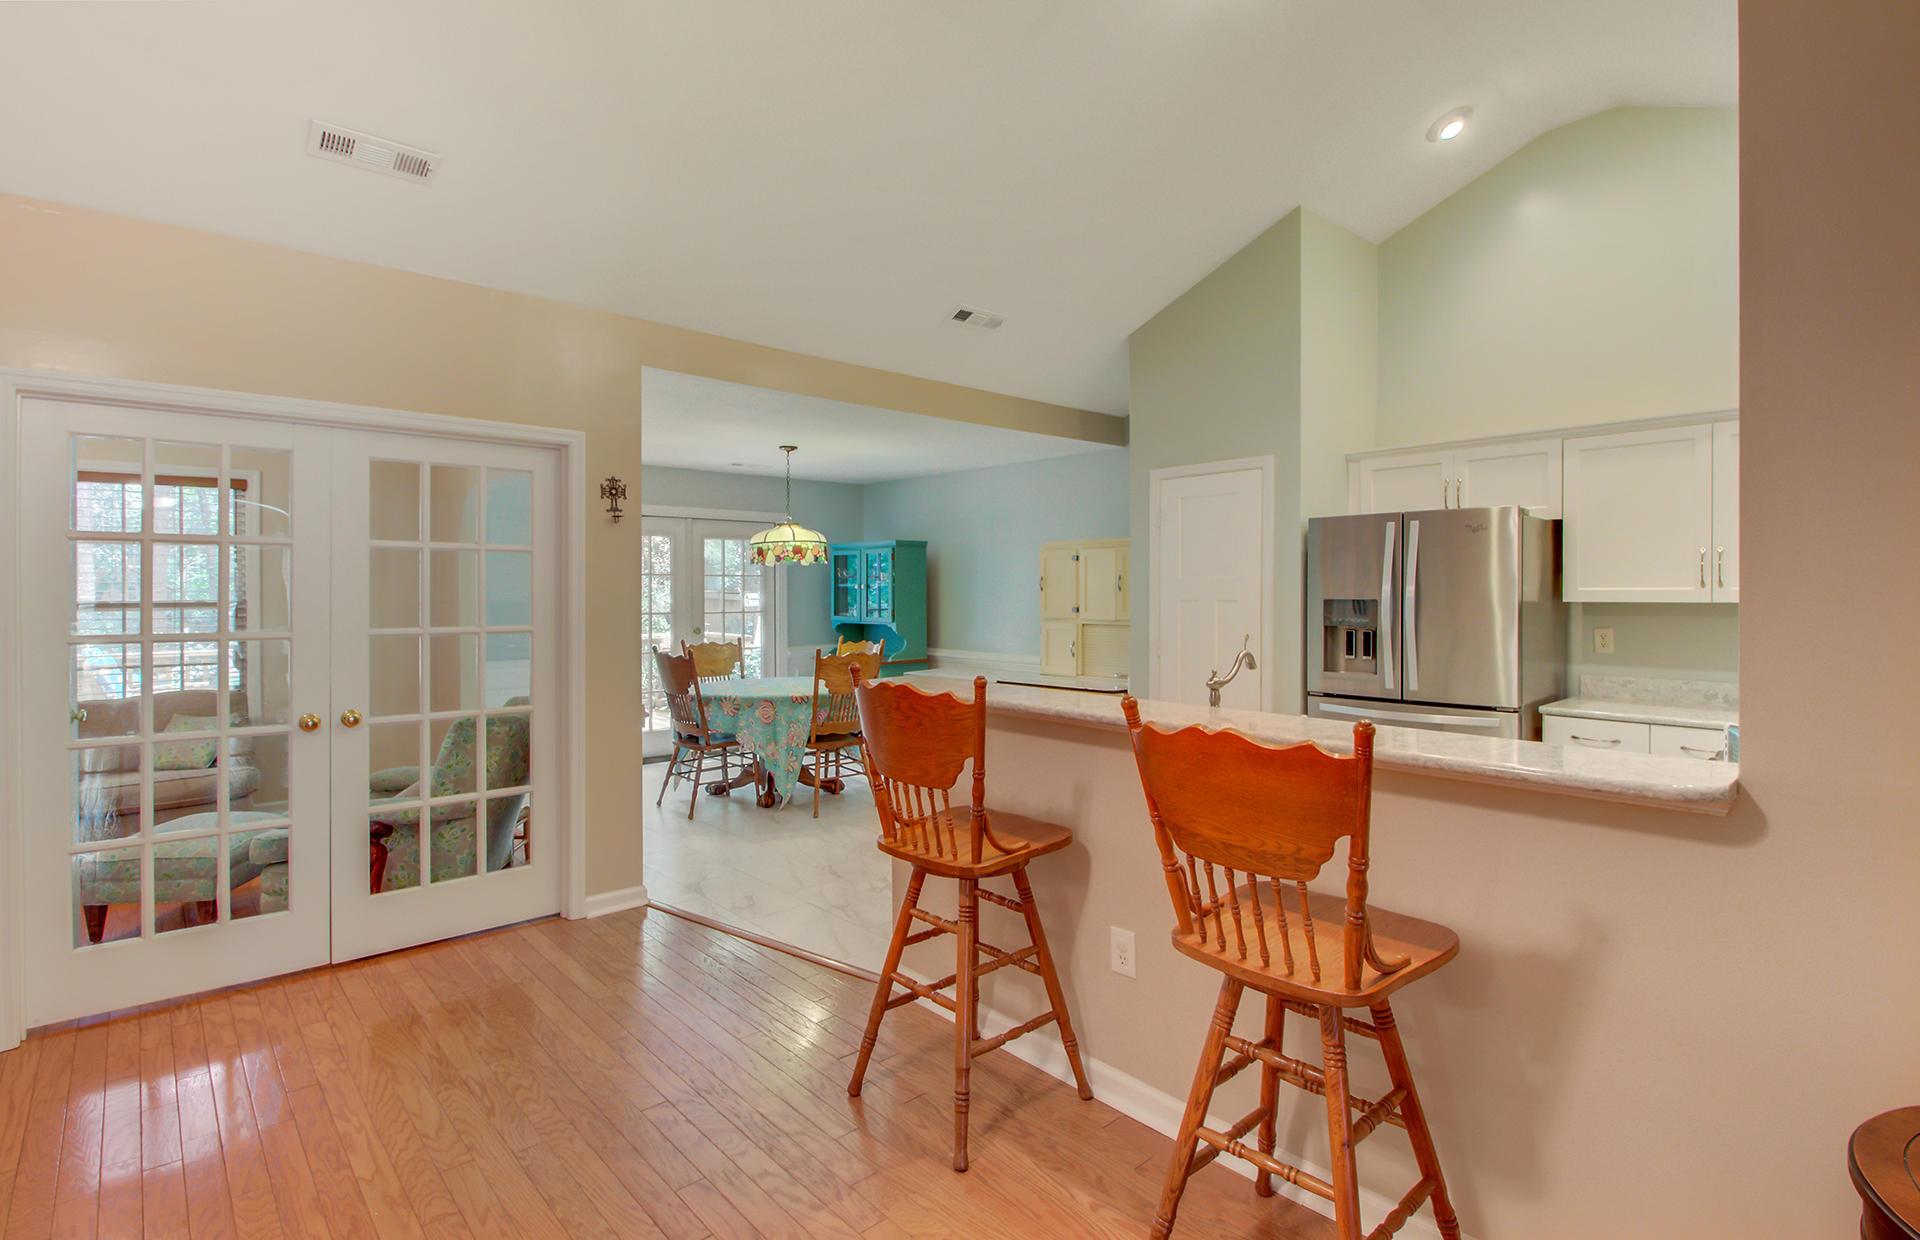 Park West Homes For Sale - 1500 Wellesley, Mount Pleasant, SC - 26